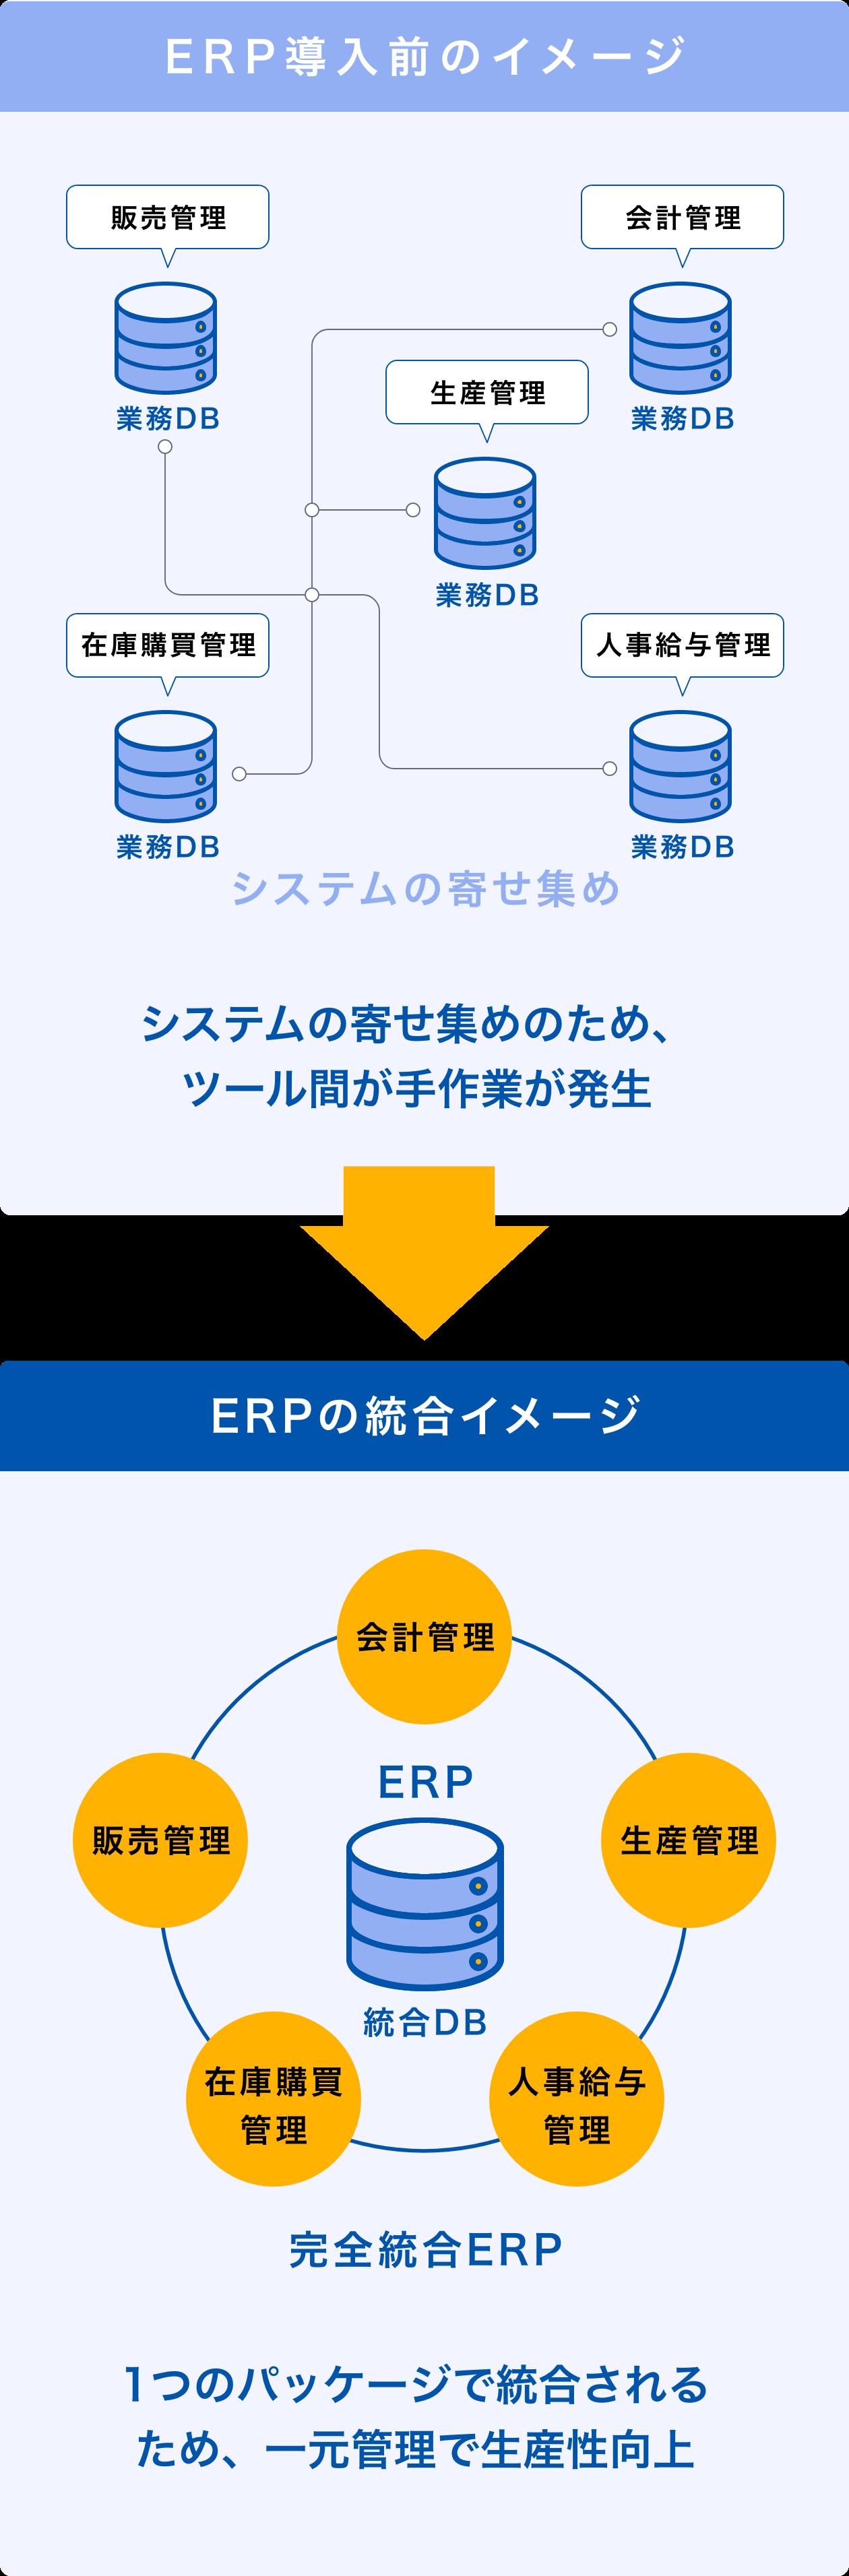 ERPの導入前イメージとERPの統合イメージ